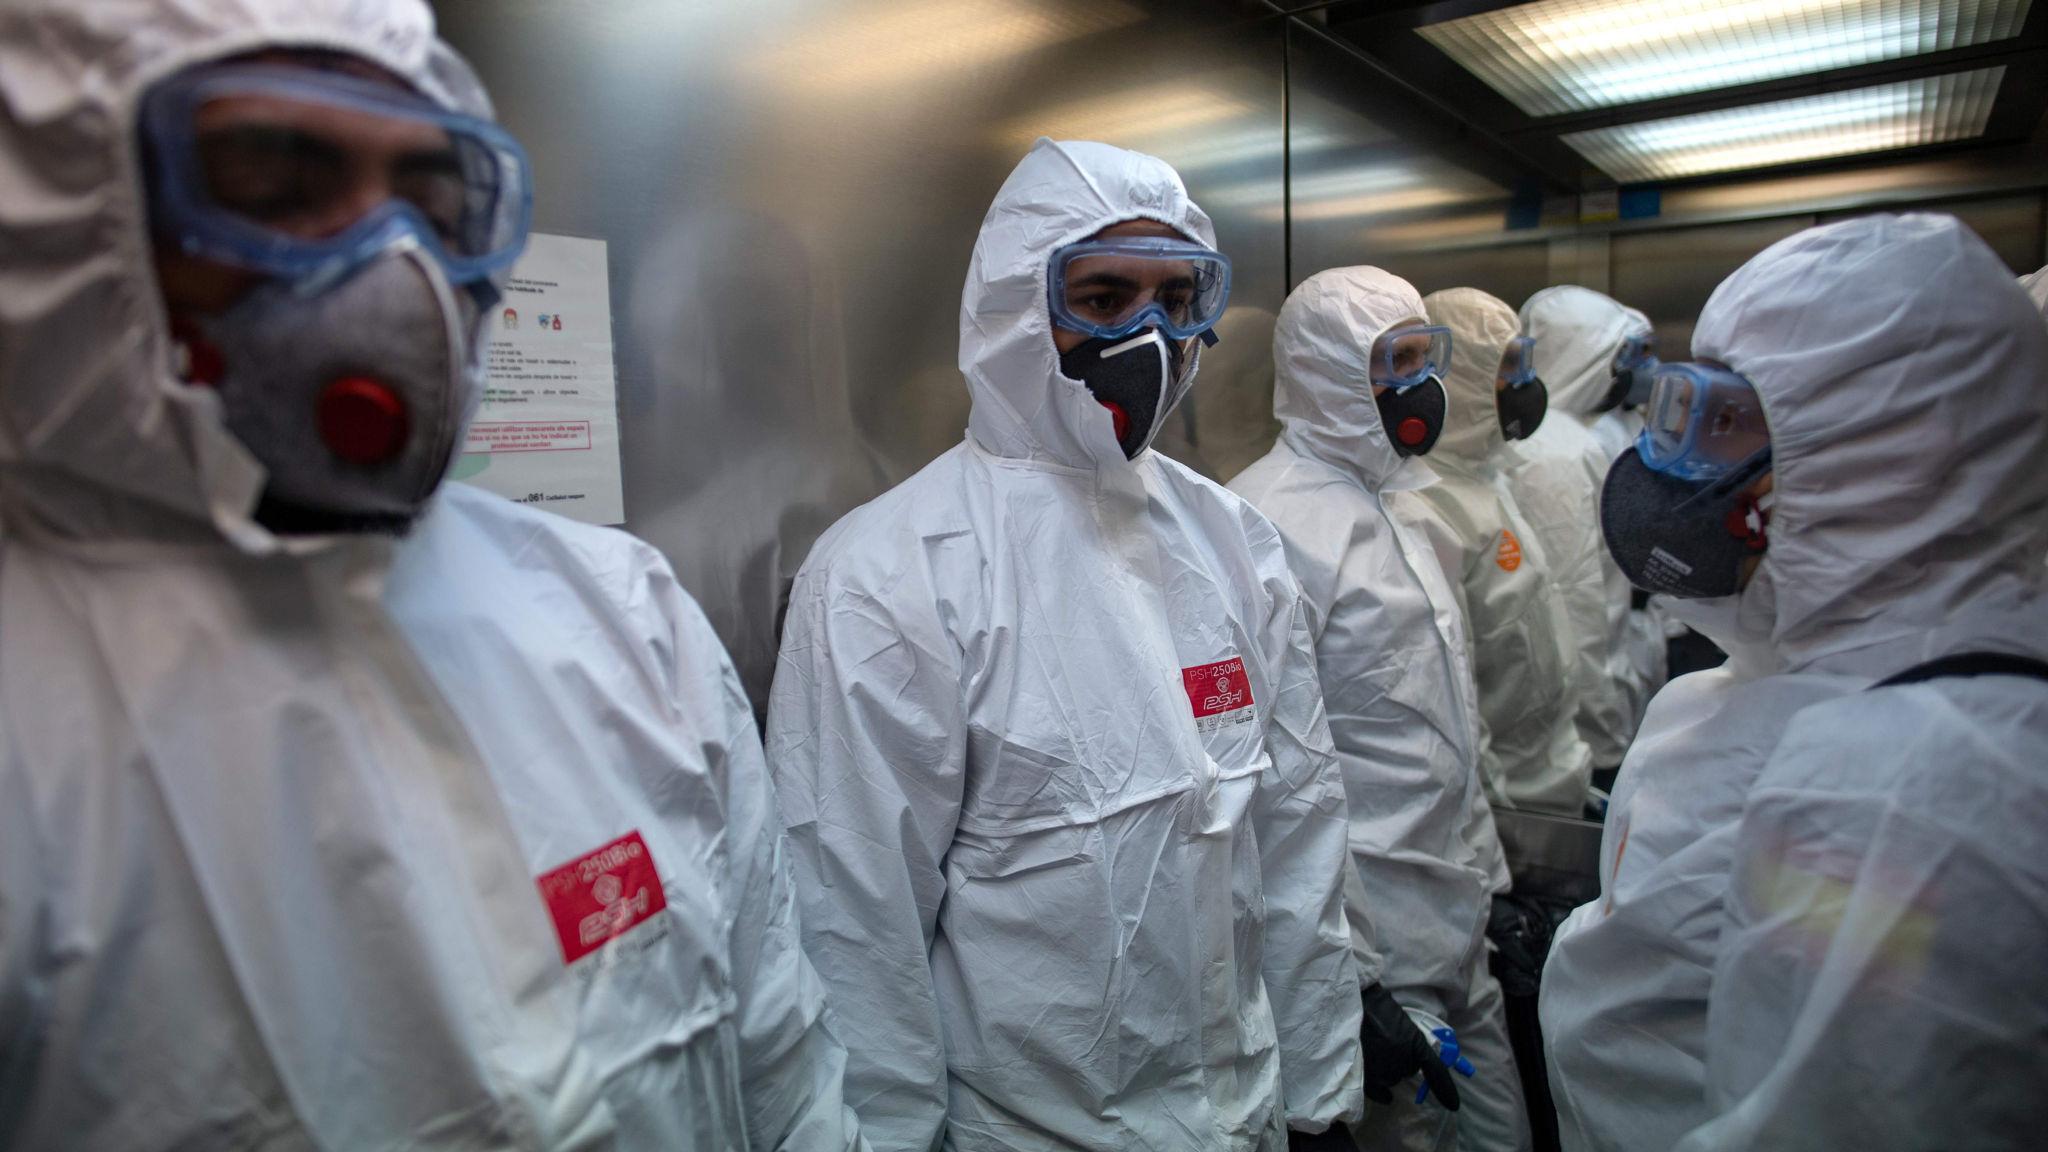 51 Italian doctors die from coronvirus